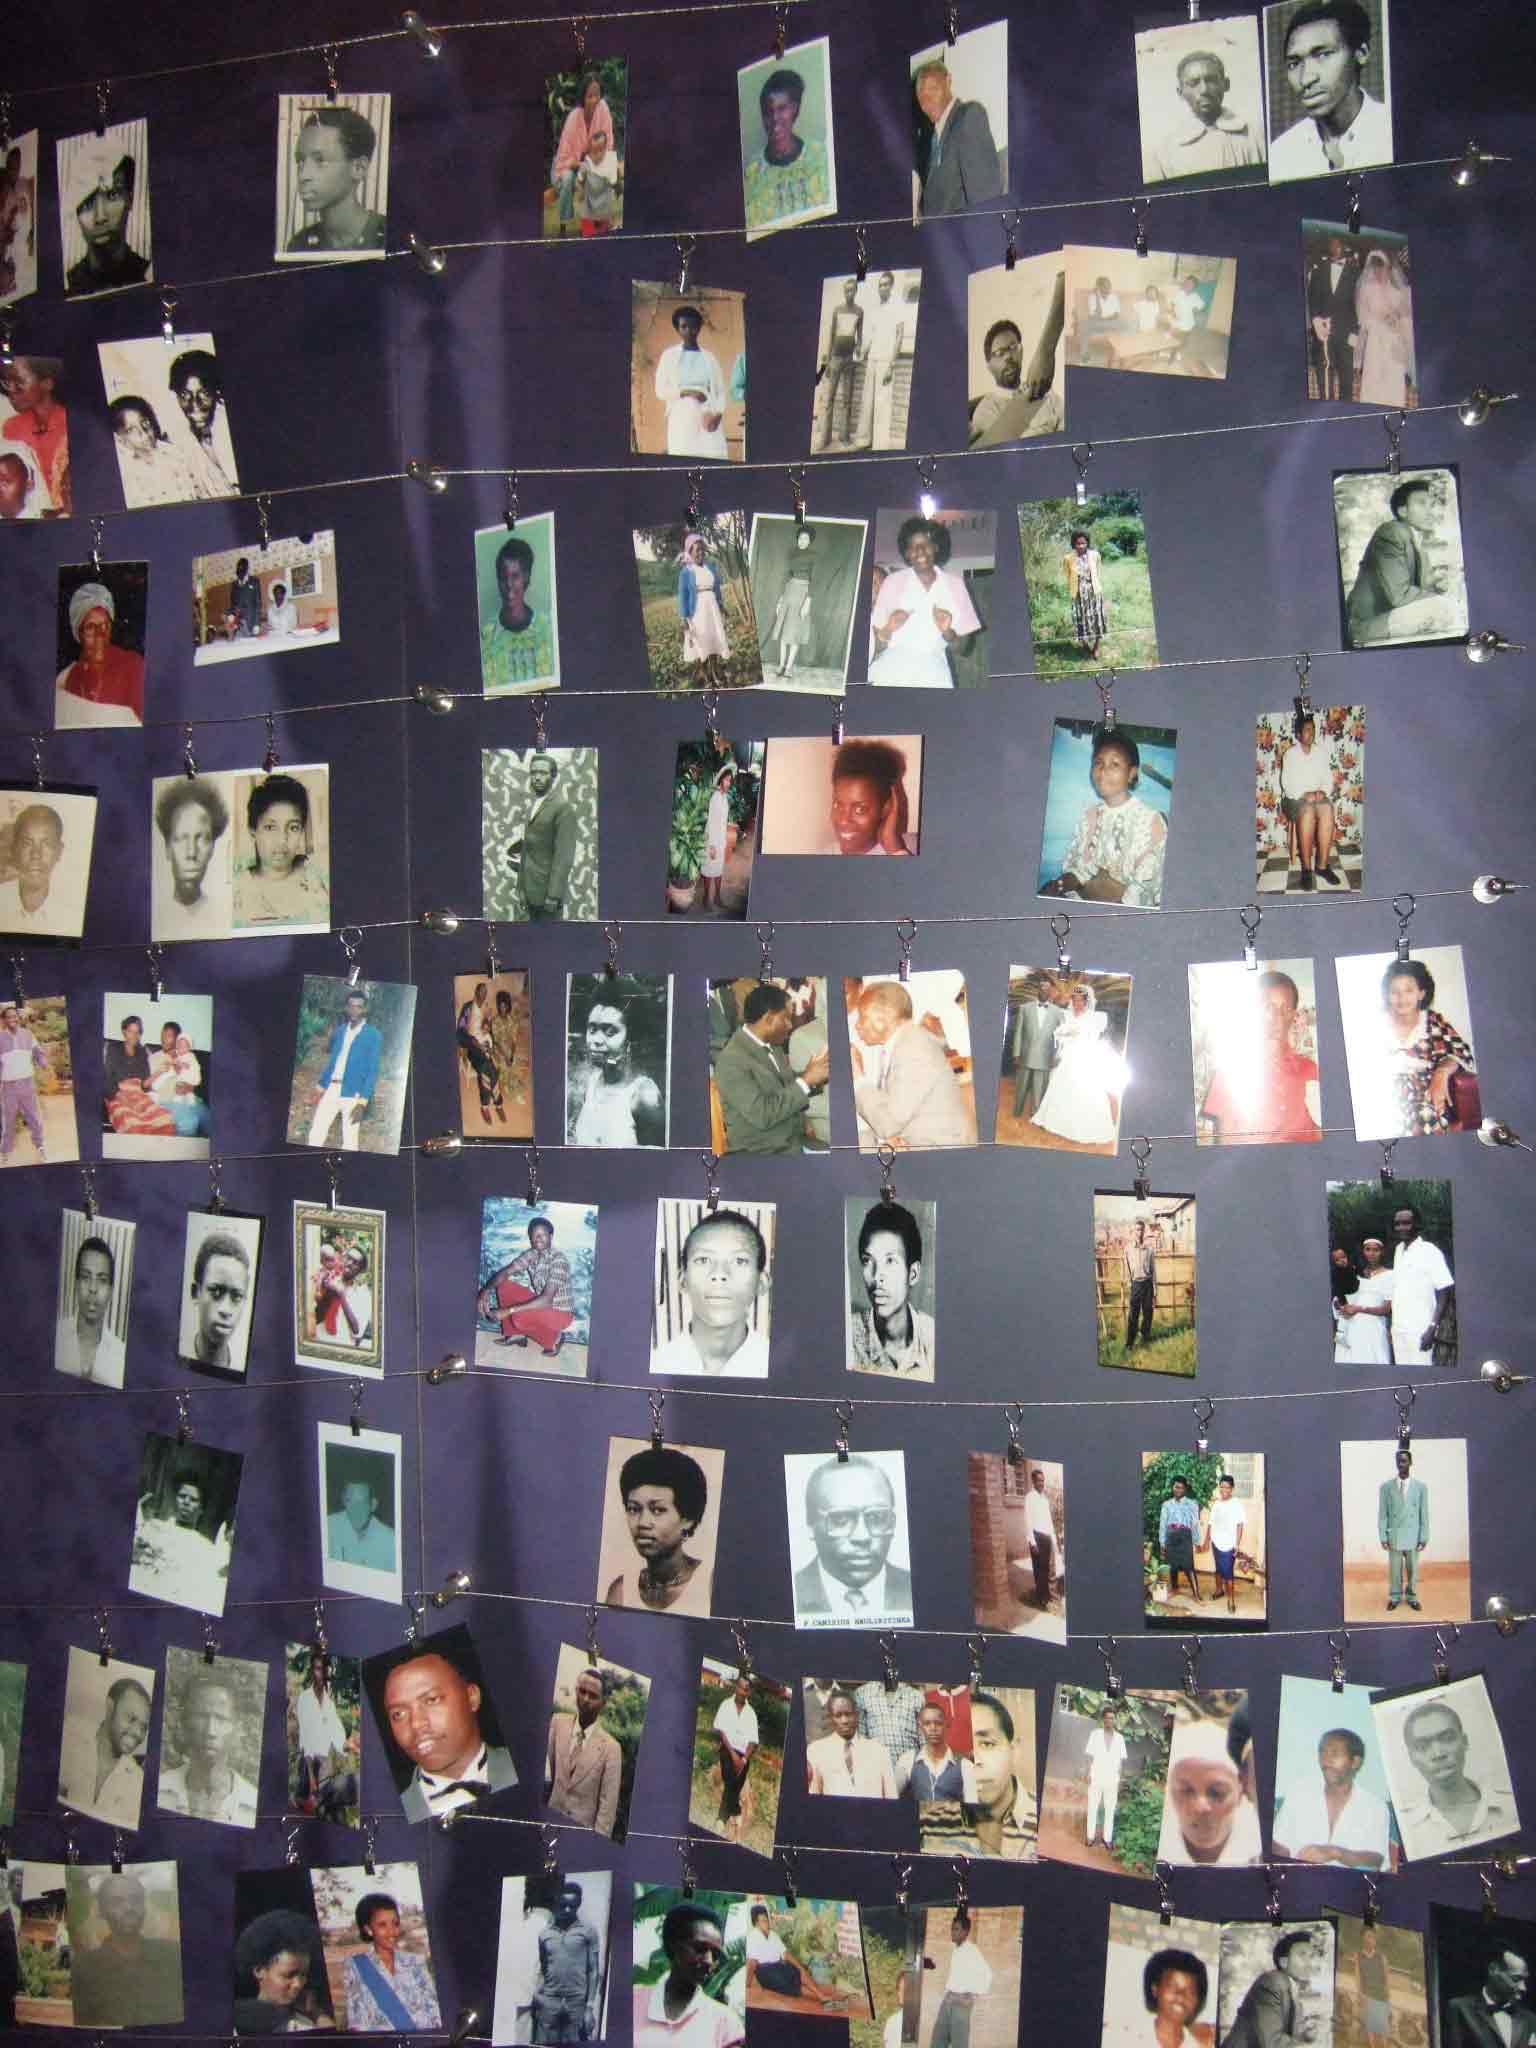 génocide Rwanda exposition Mémorial Shoah